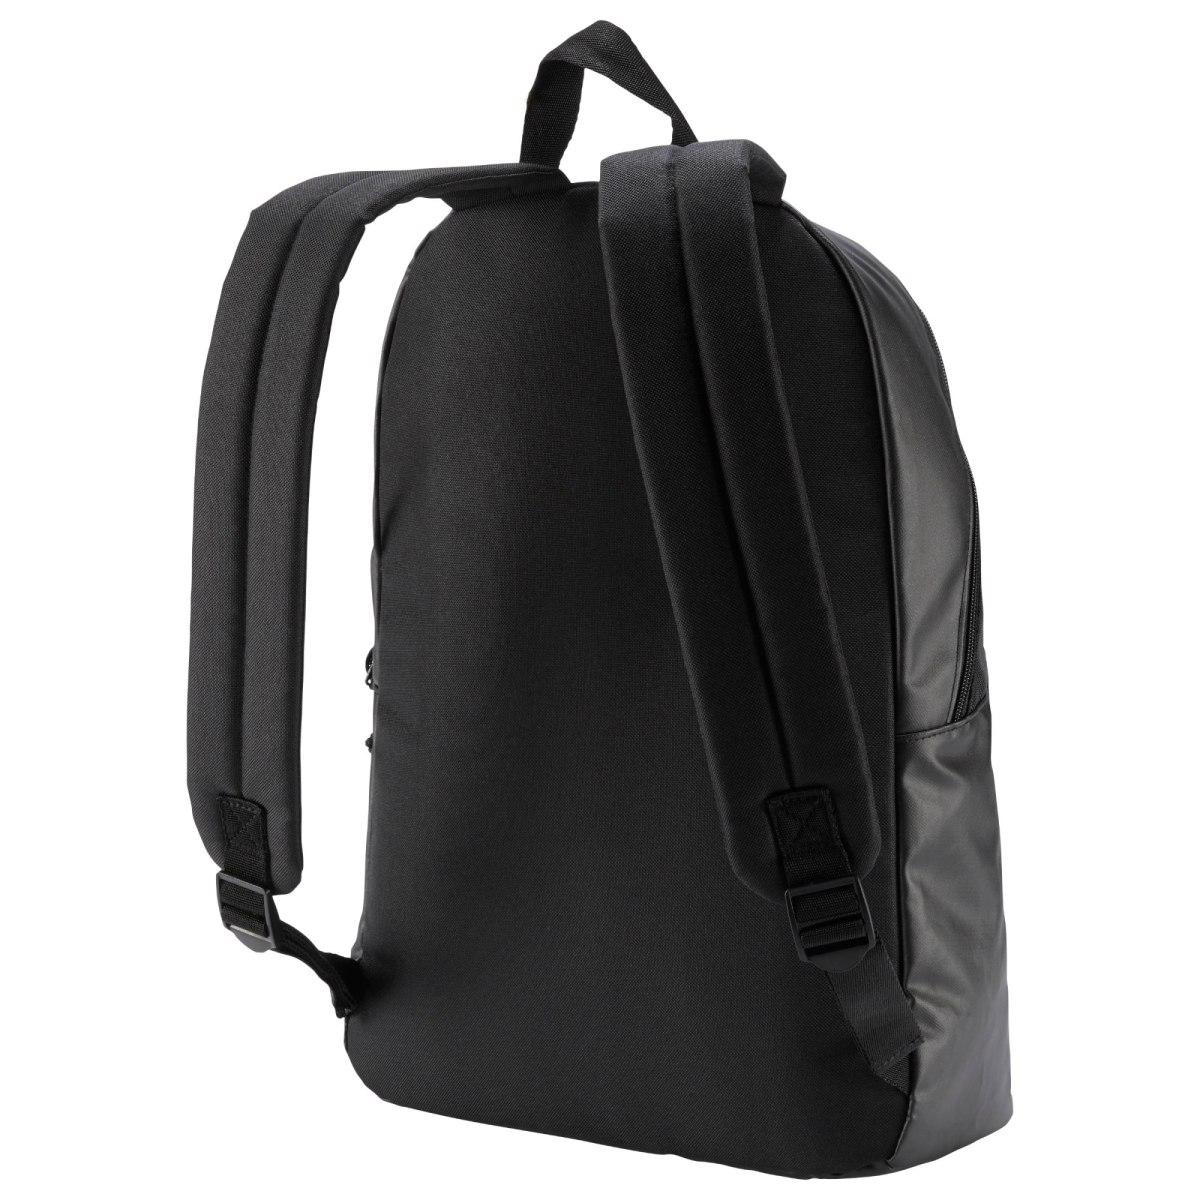 Classics_Core_Backpack_Black_DA1231_02_standard_hover